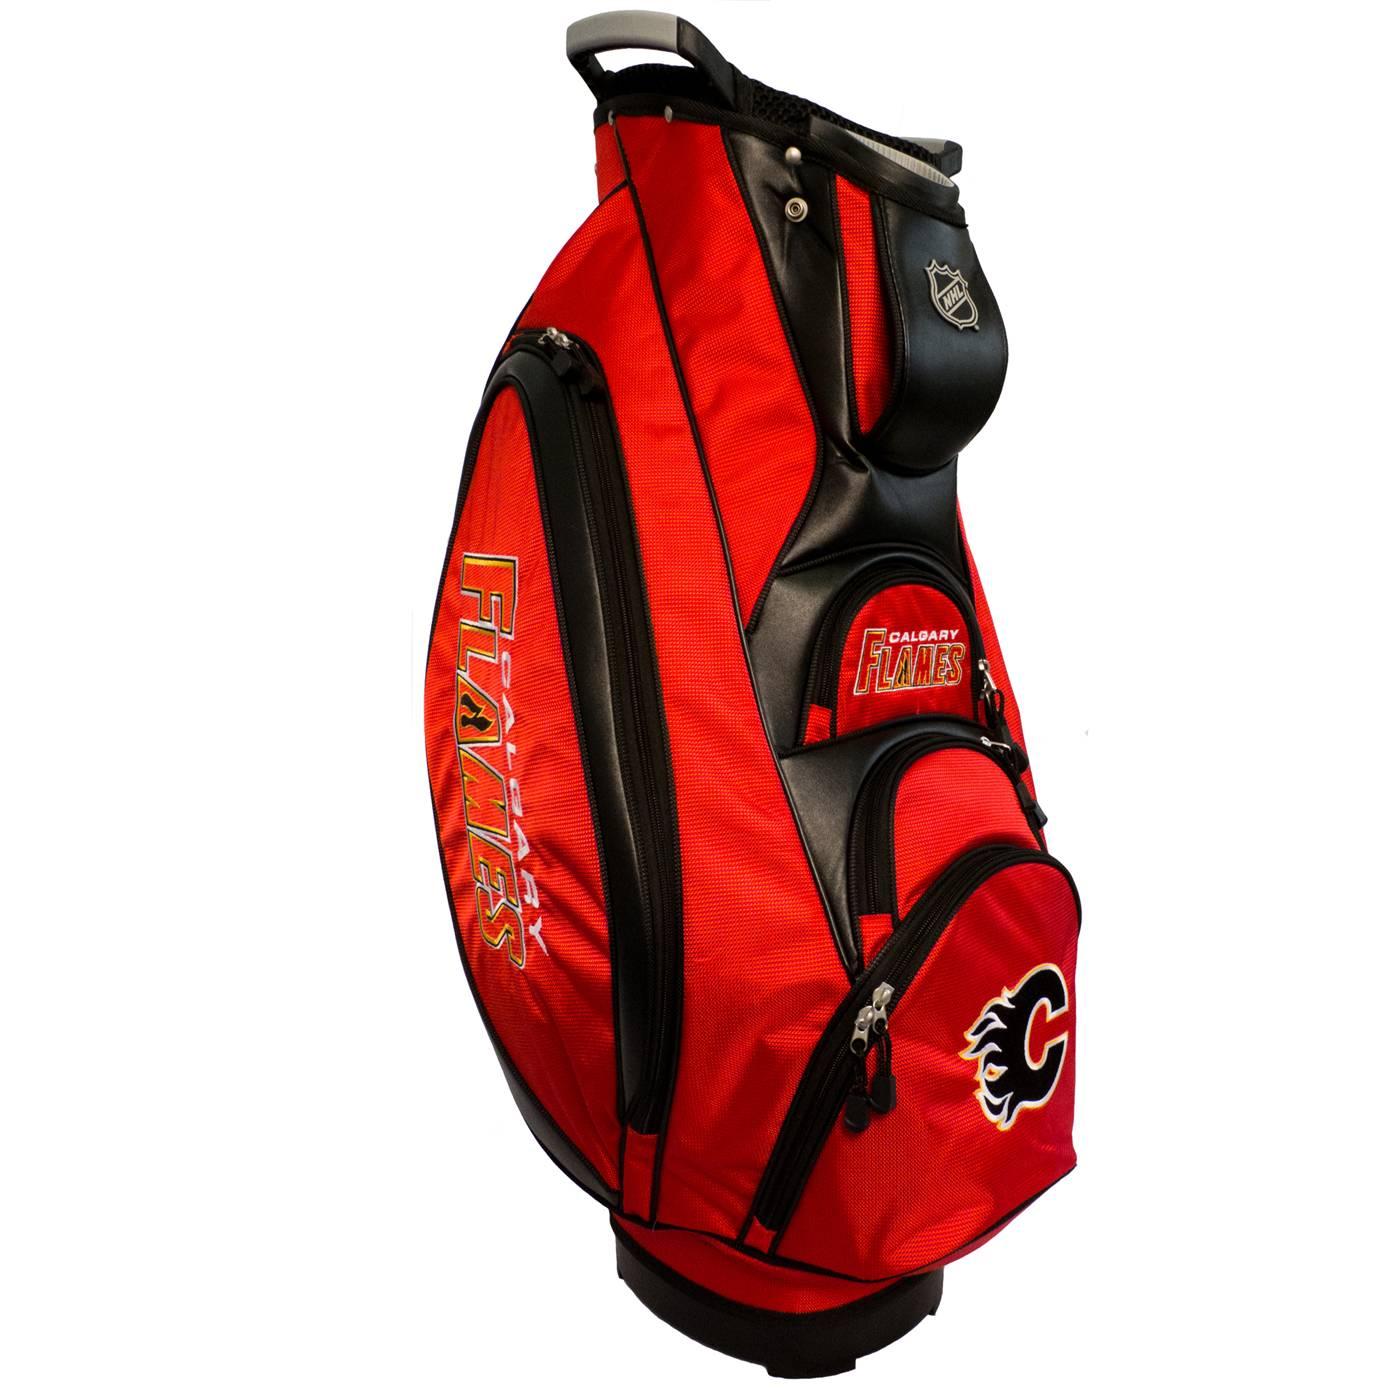 Calgary flames victory golf cart bag